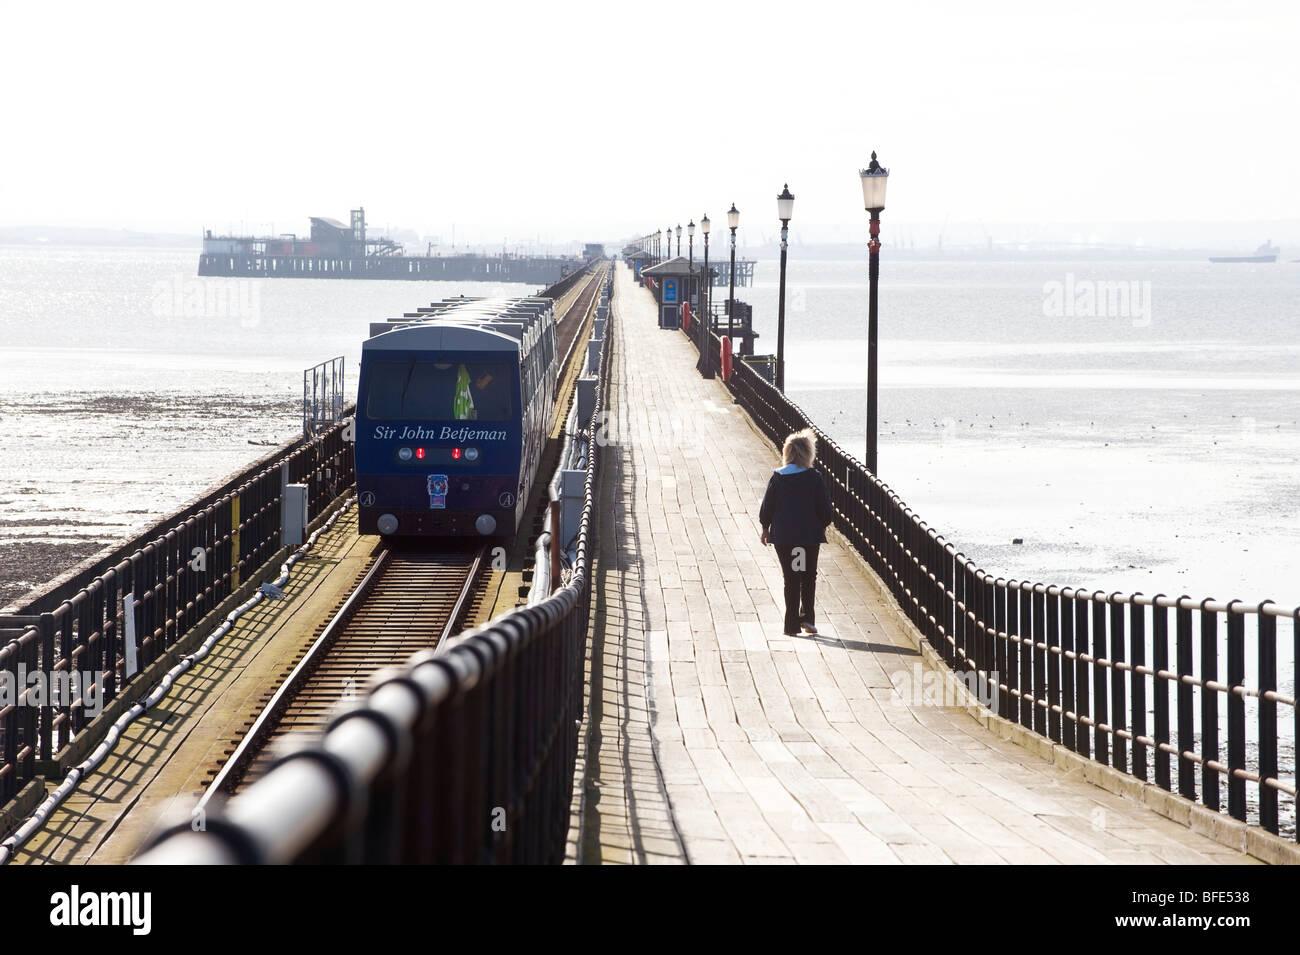 Southend Pier - the worlds longest pleasure pier, the Sir John Betjeman train sets off on the 1.33 mile journey. - Stock Image